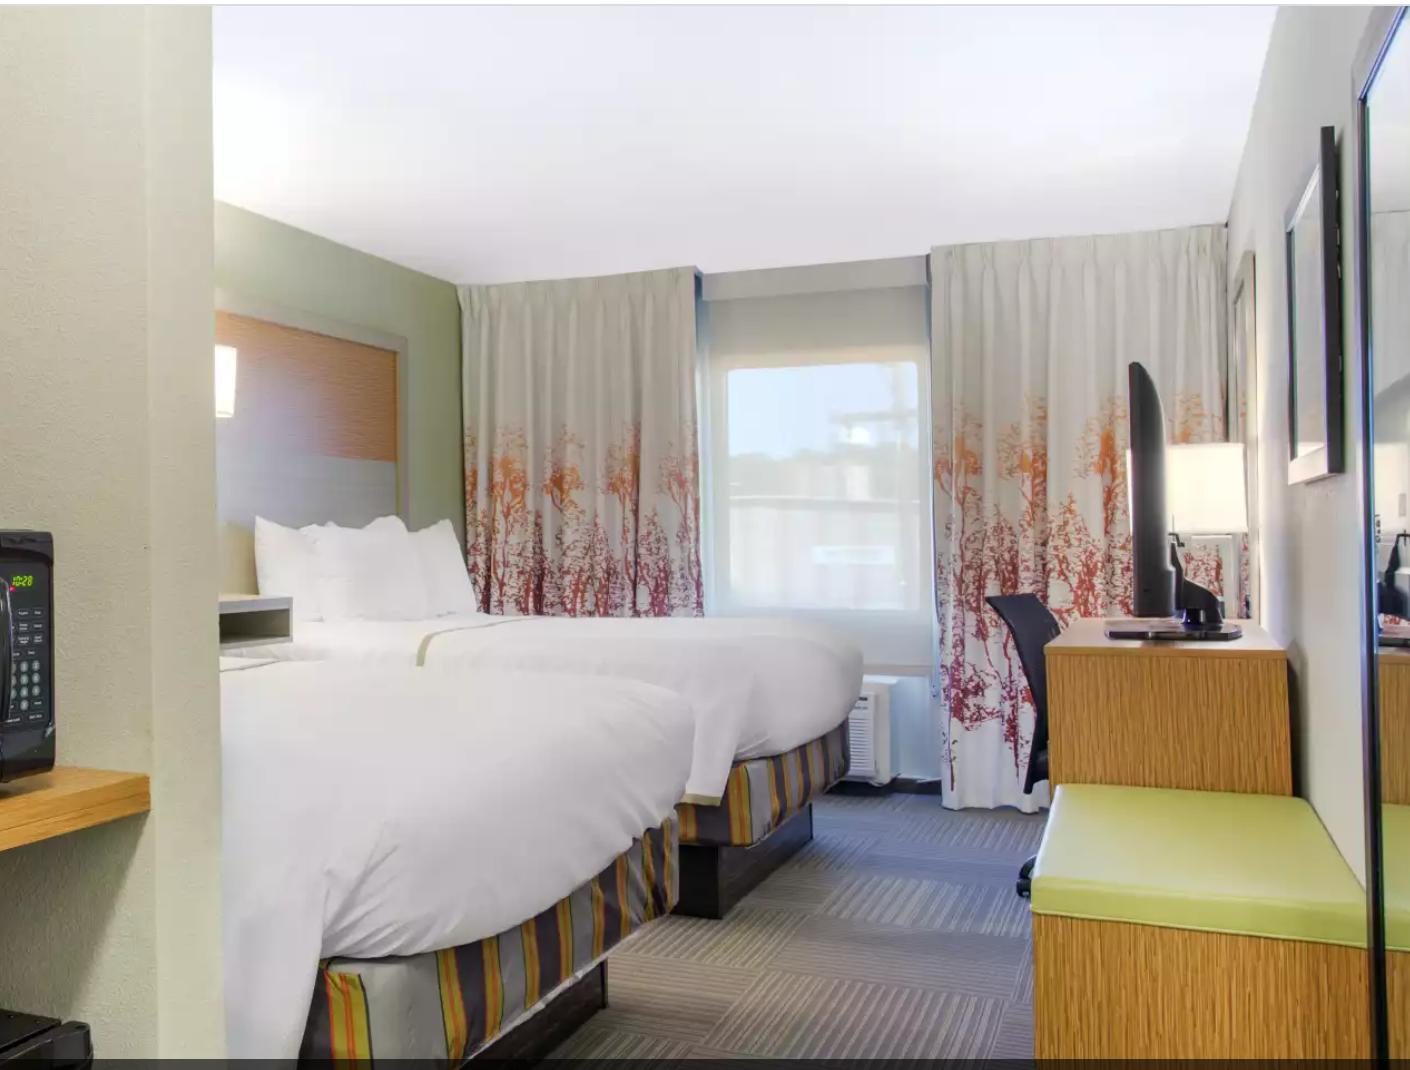 https://www.hotelsbyday.com/_data/default-hotel_image/3/19083/screenshot-2020-06-23-at-2-54-33-pm.png